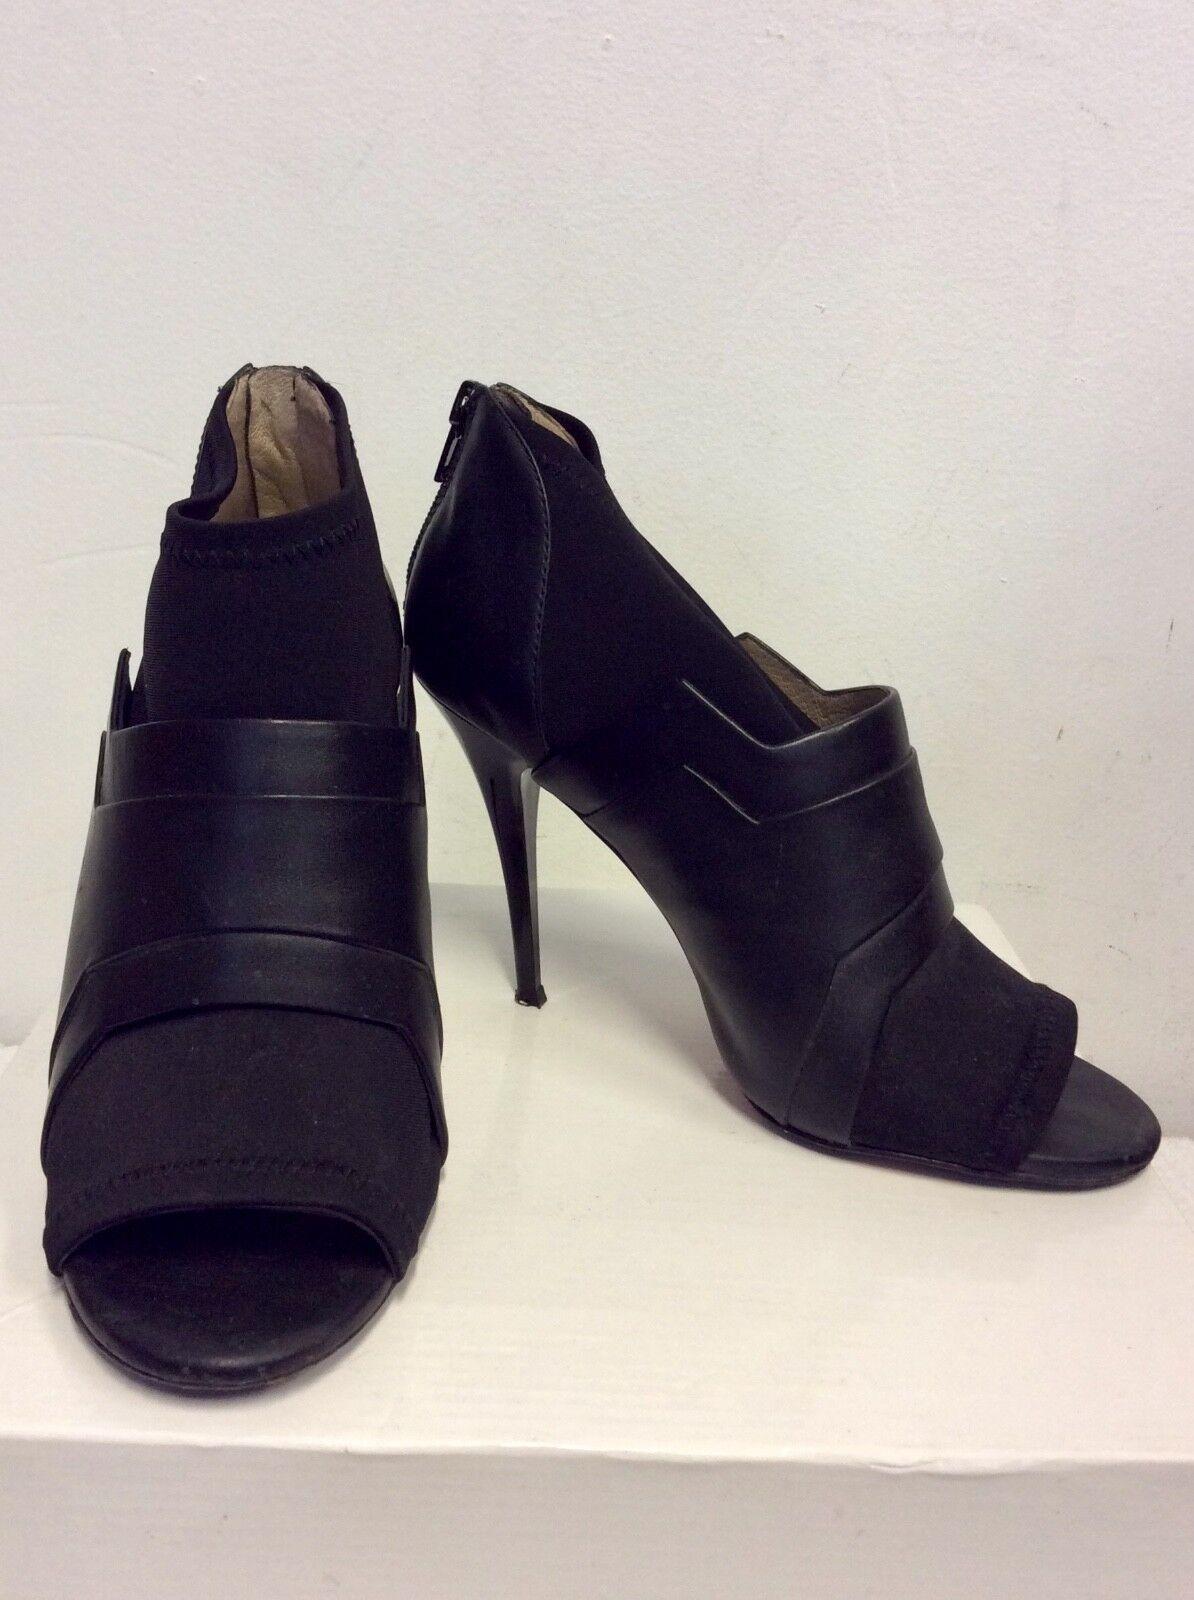 DANIEL schwarz LEATHER & ELASTICATED FABRIC PEEPTOE schuhe Stiefel Größe 5 38